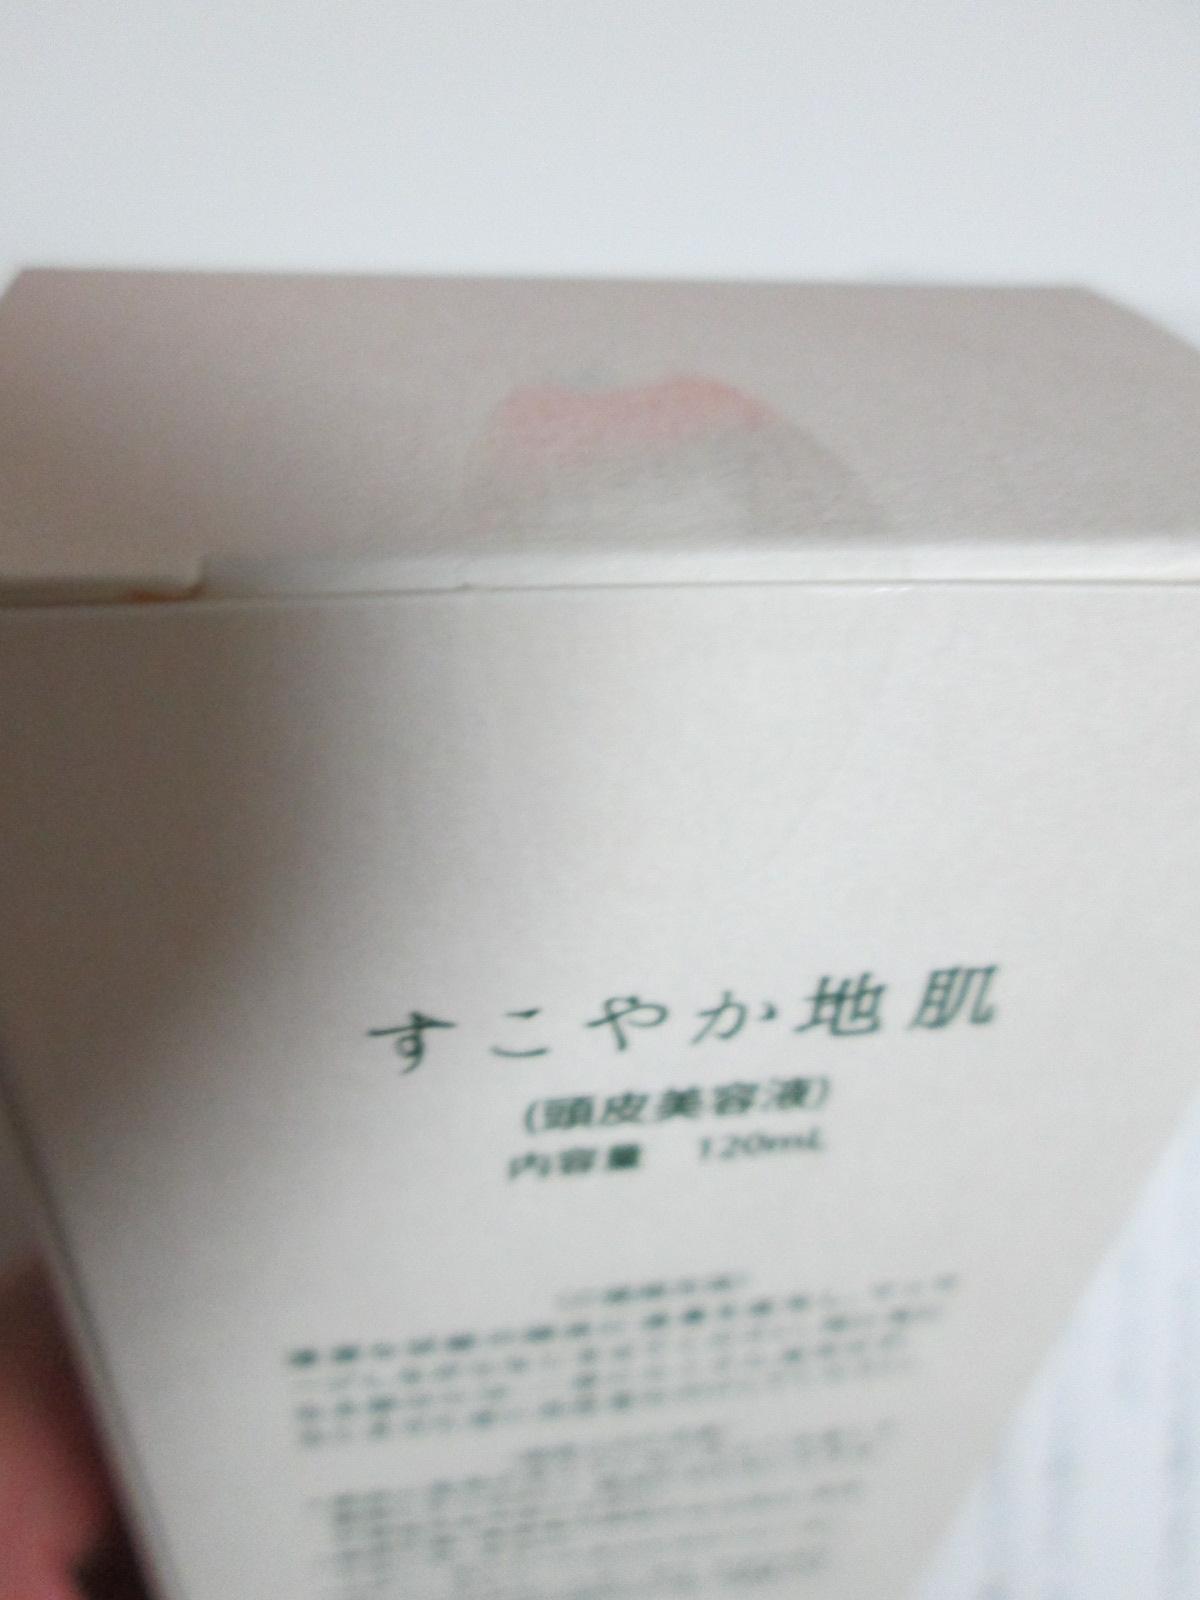 IMG_5051 すこやか地肌 (1)